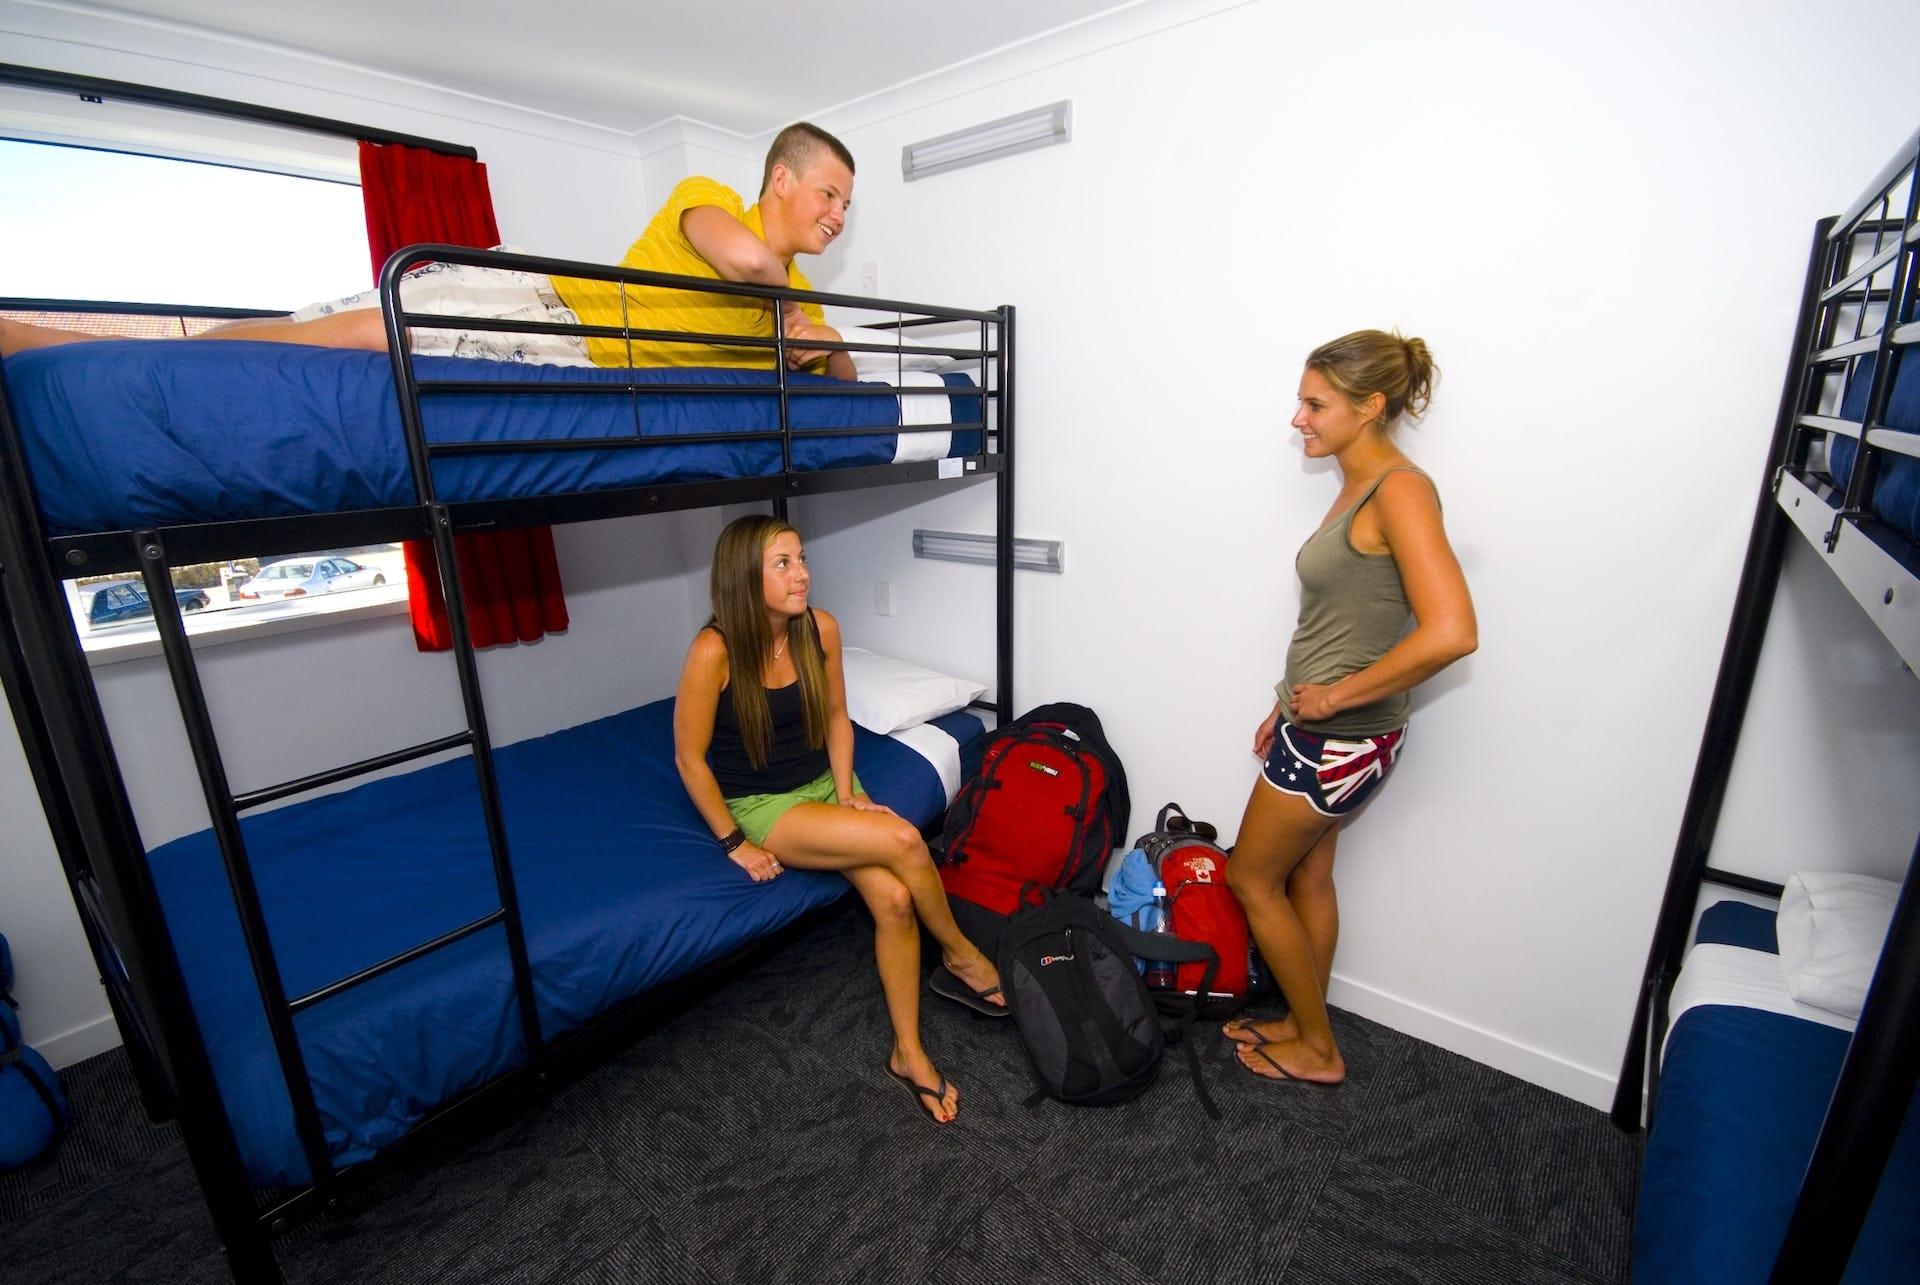 Base陶波背包客旅馆的4床宿舍